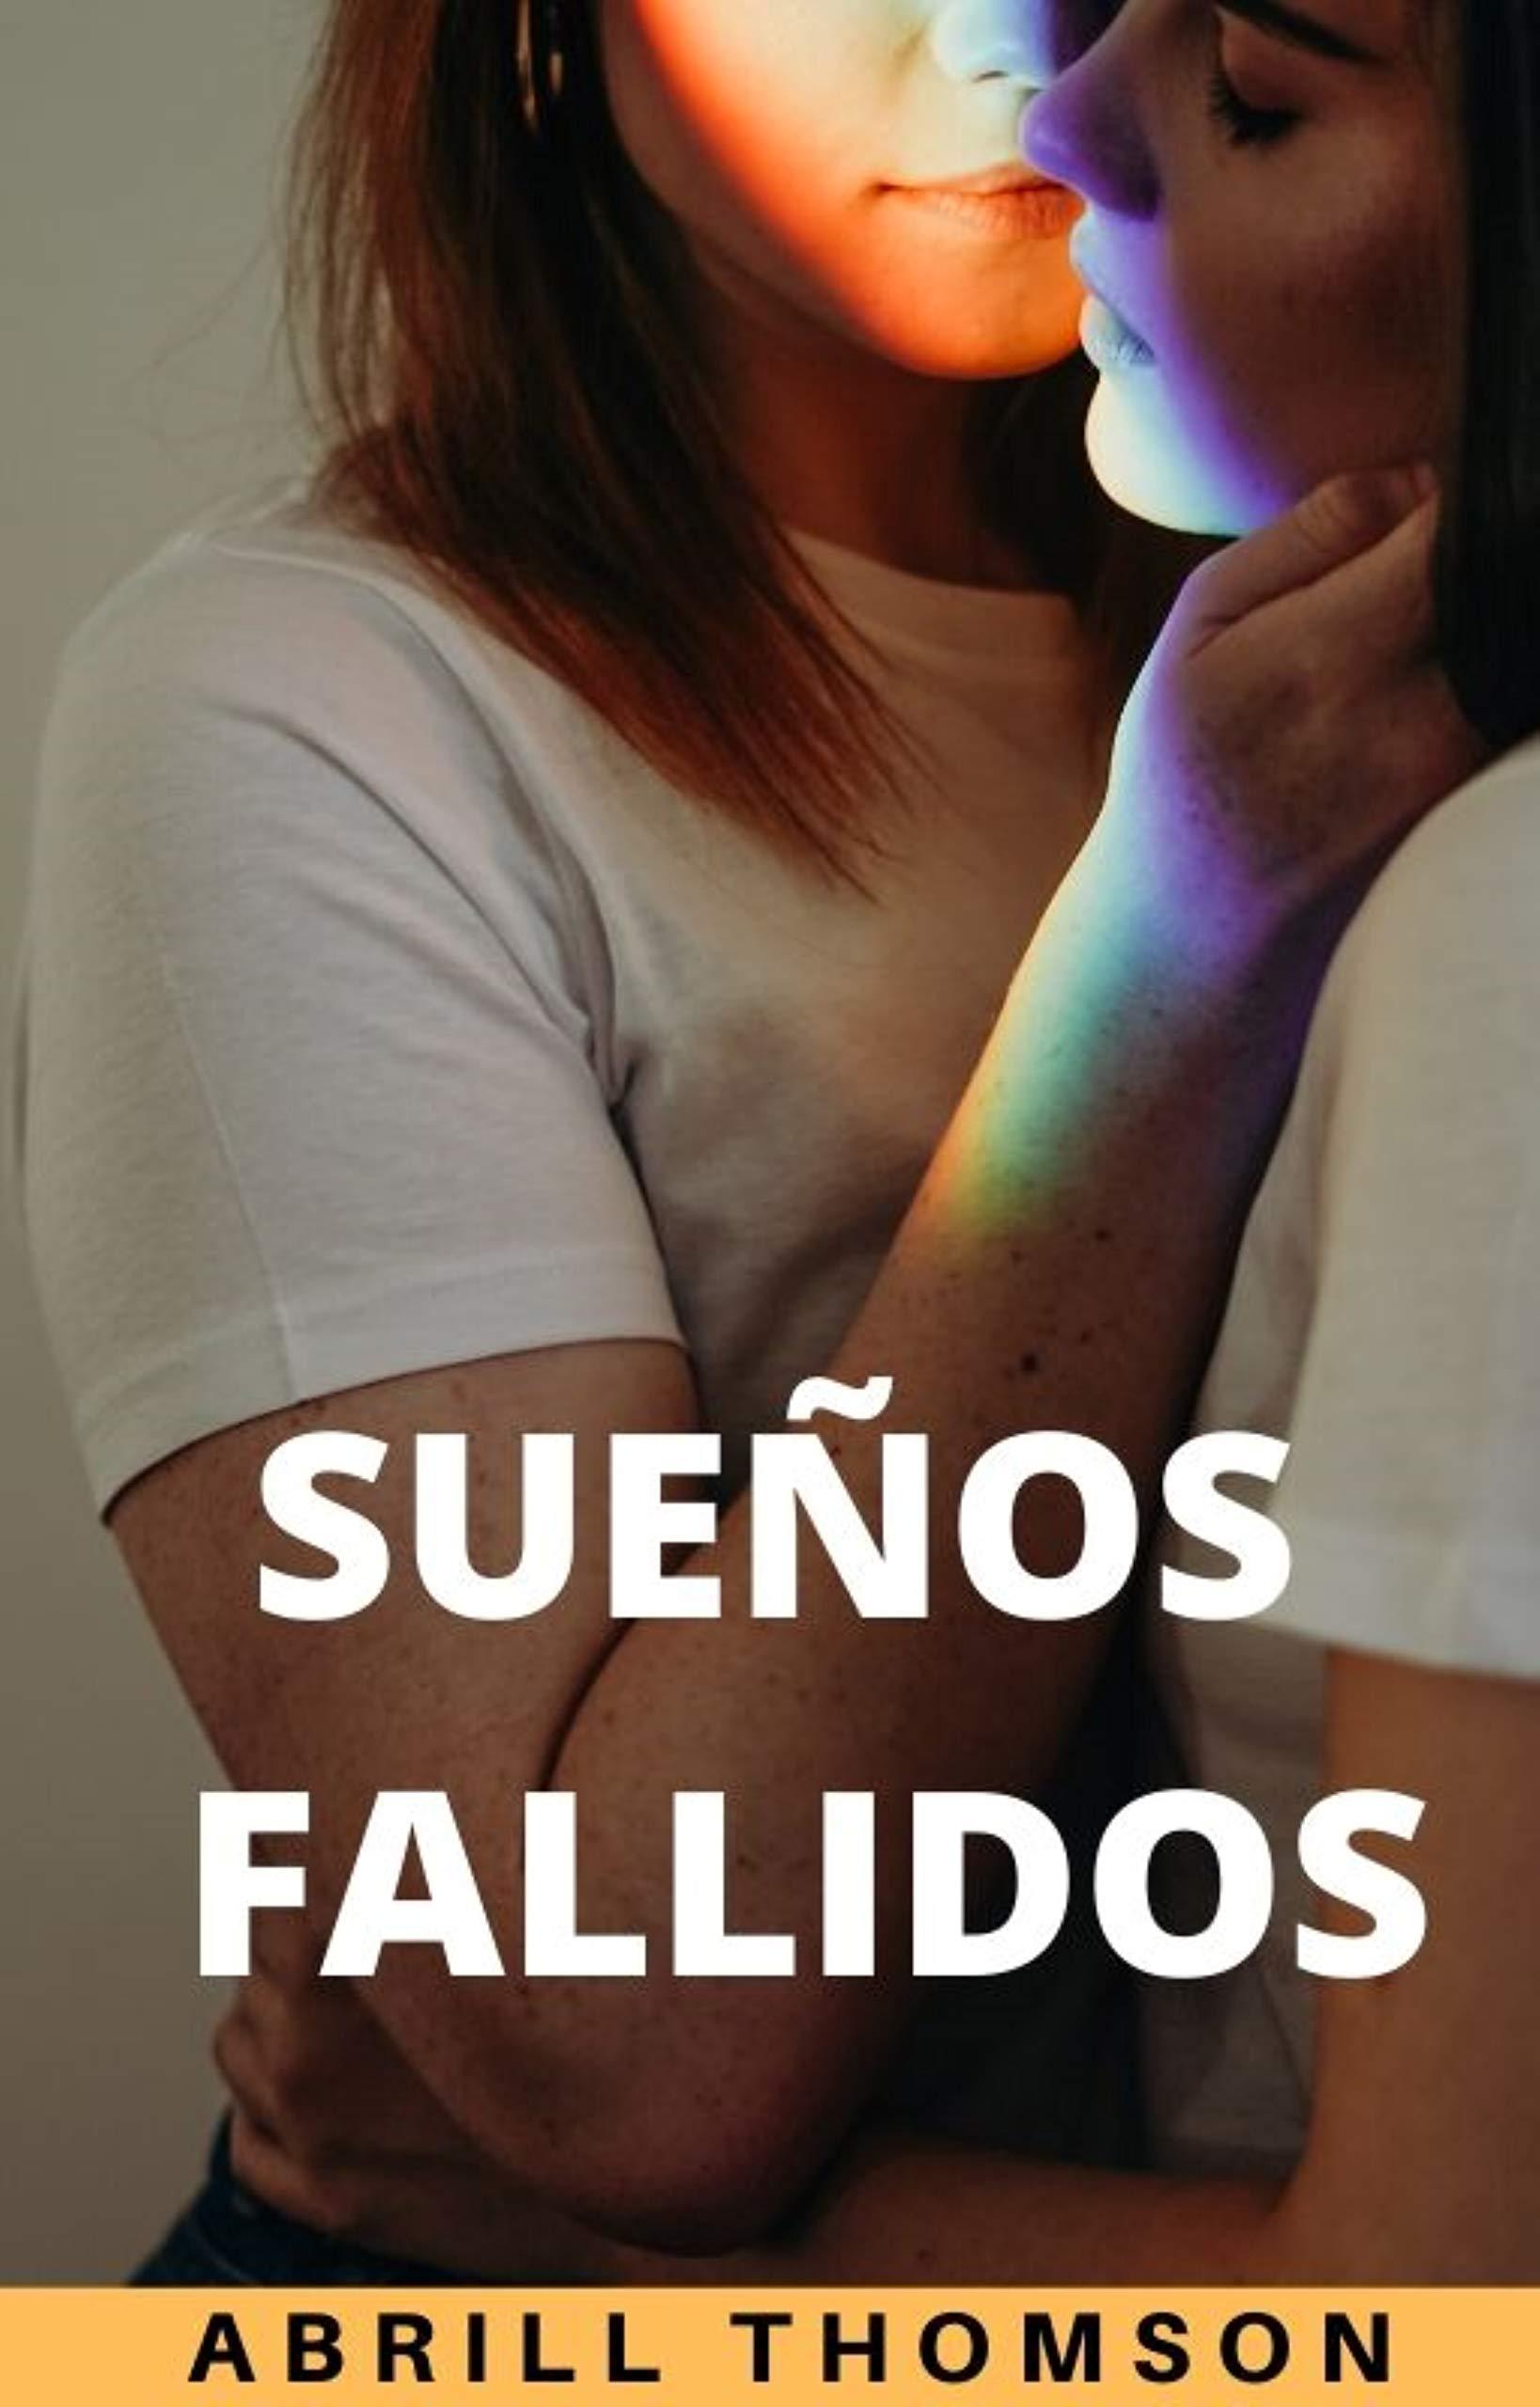 SUEÑOS FALLIDOS: Una novela de romance lésbico por Abrill Thomson